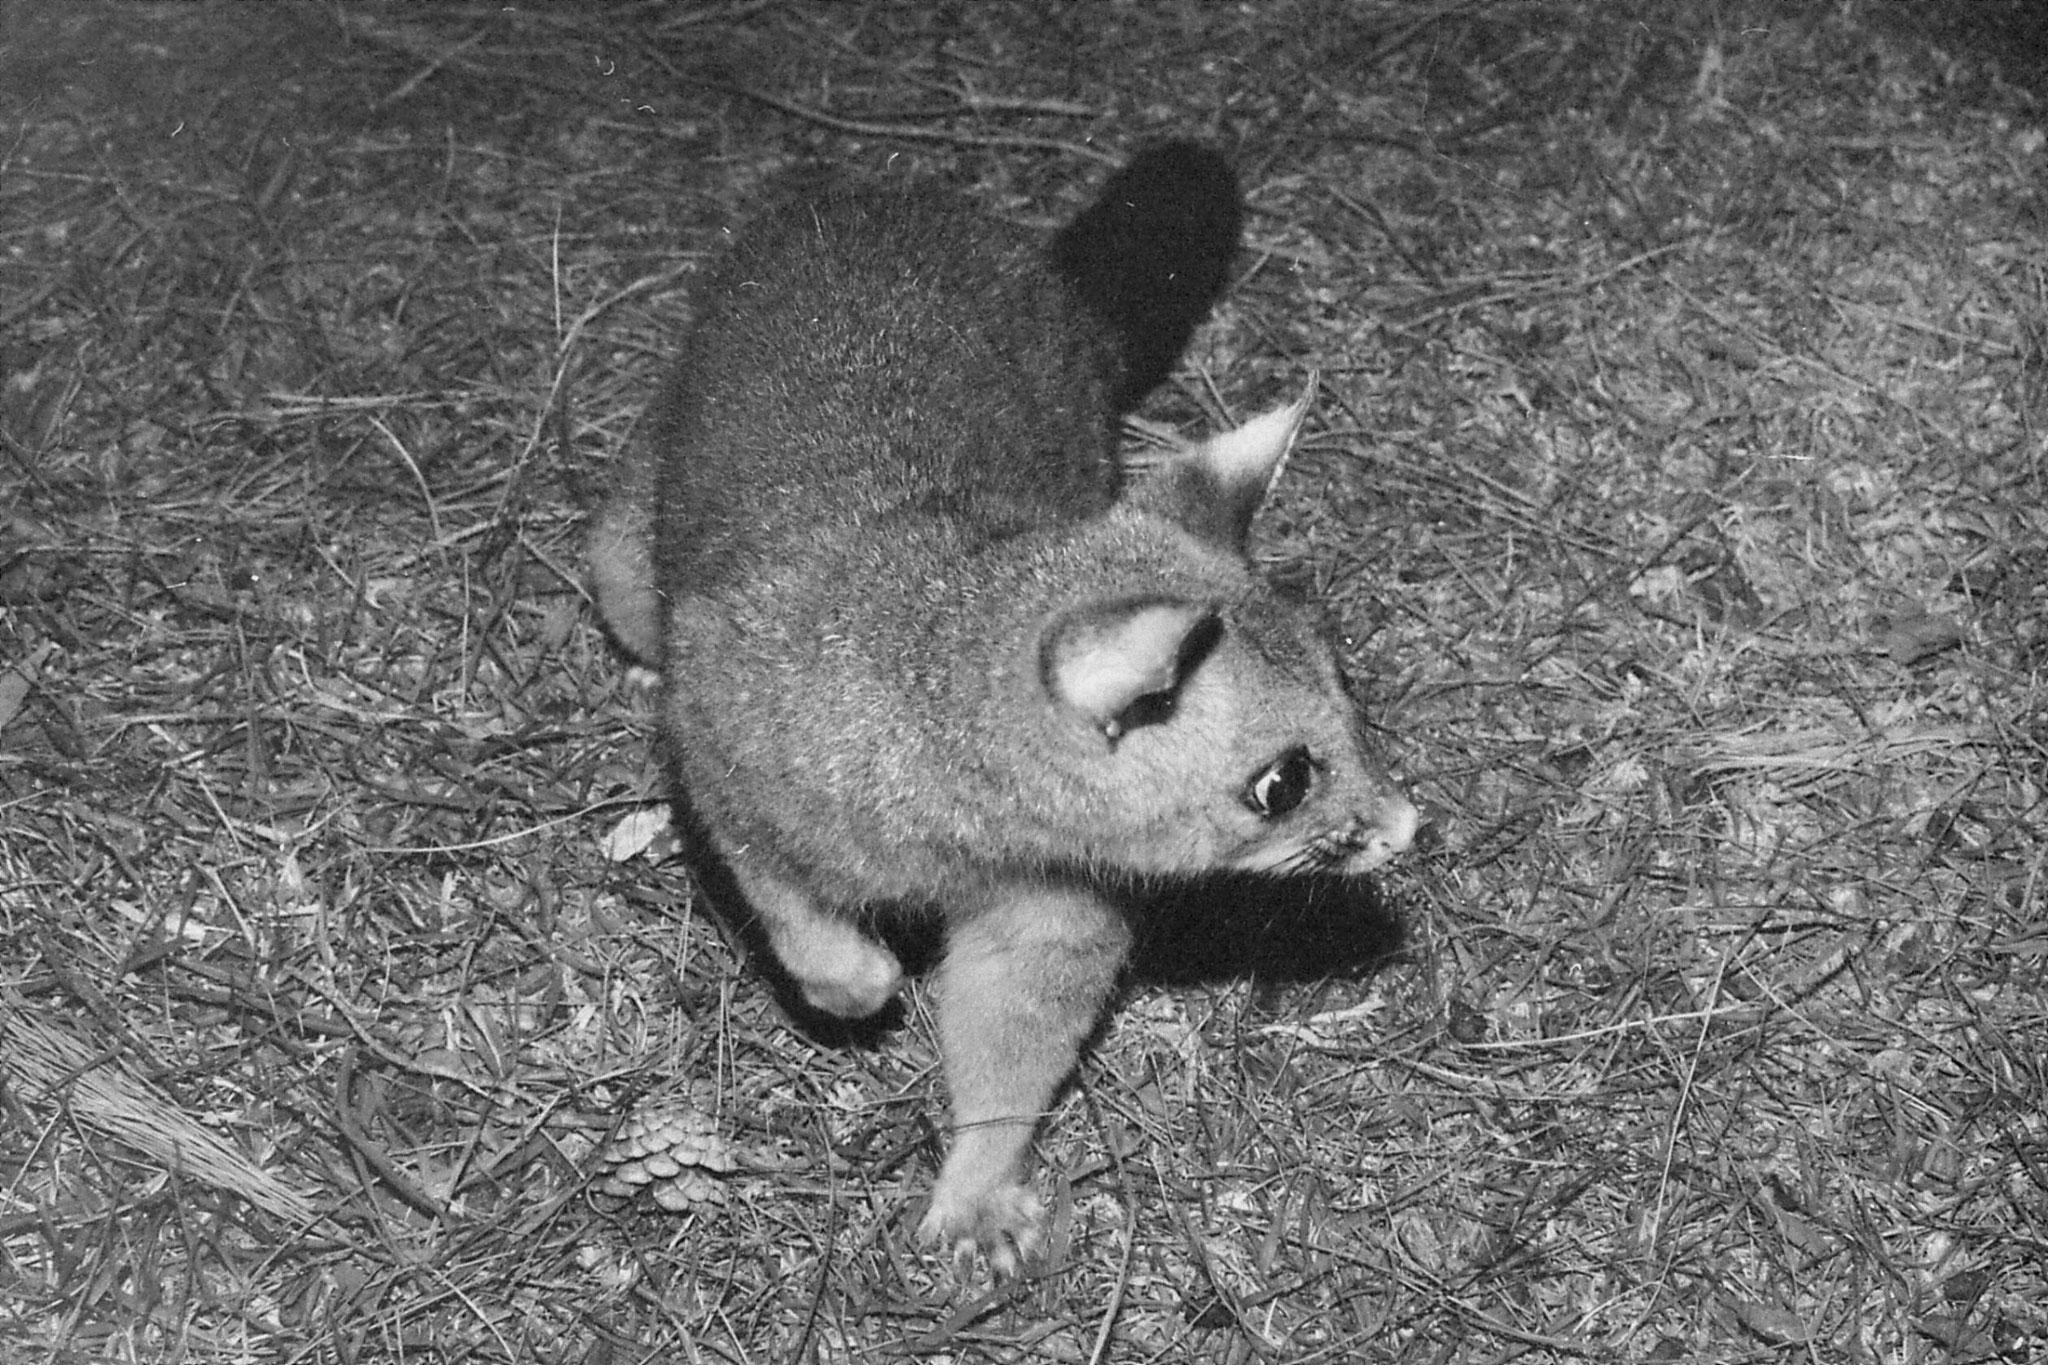 22/9/1990: 5: Dimboola Caravan Park possums